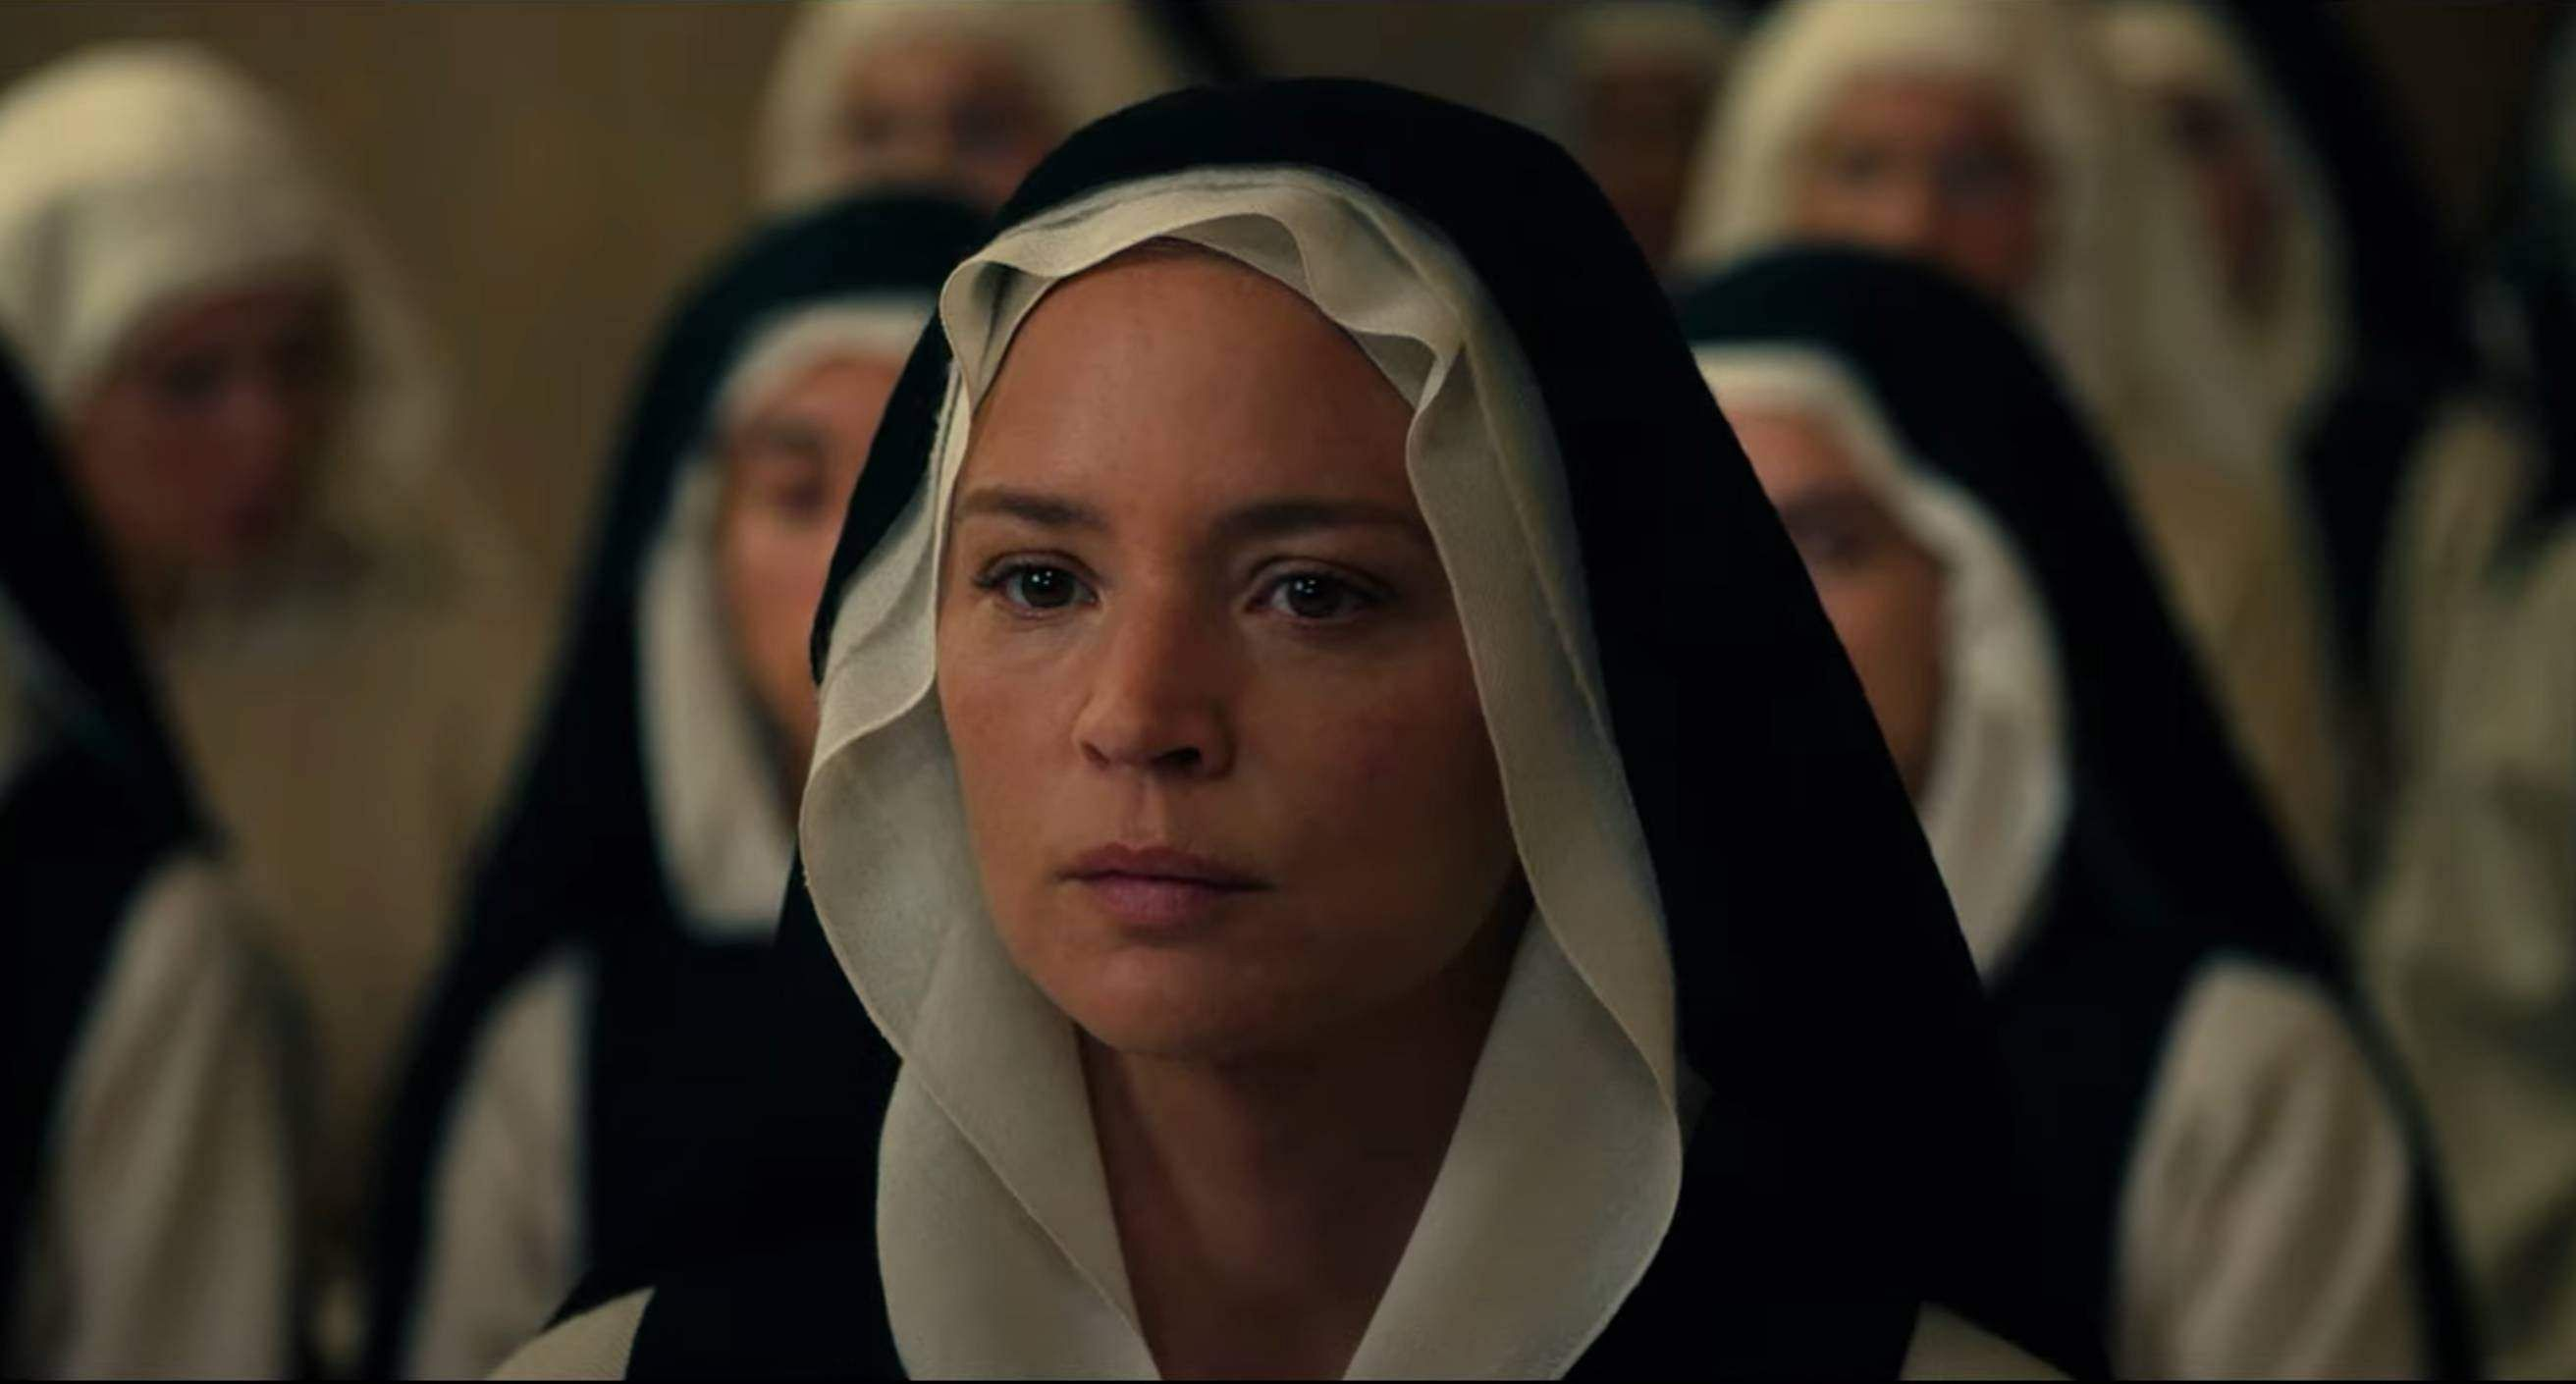 Horror movie Benedetta featuring a lesbian nun